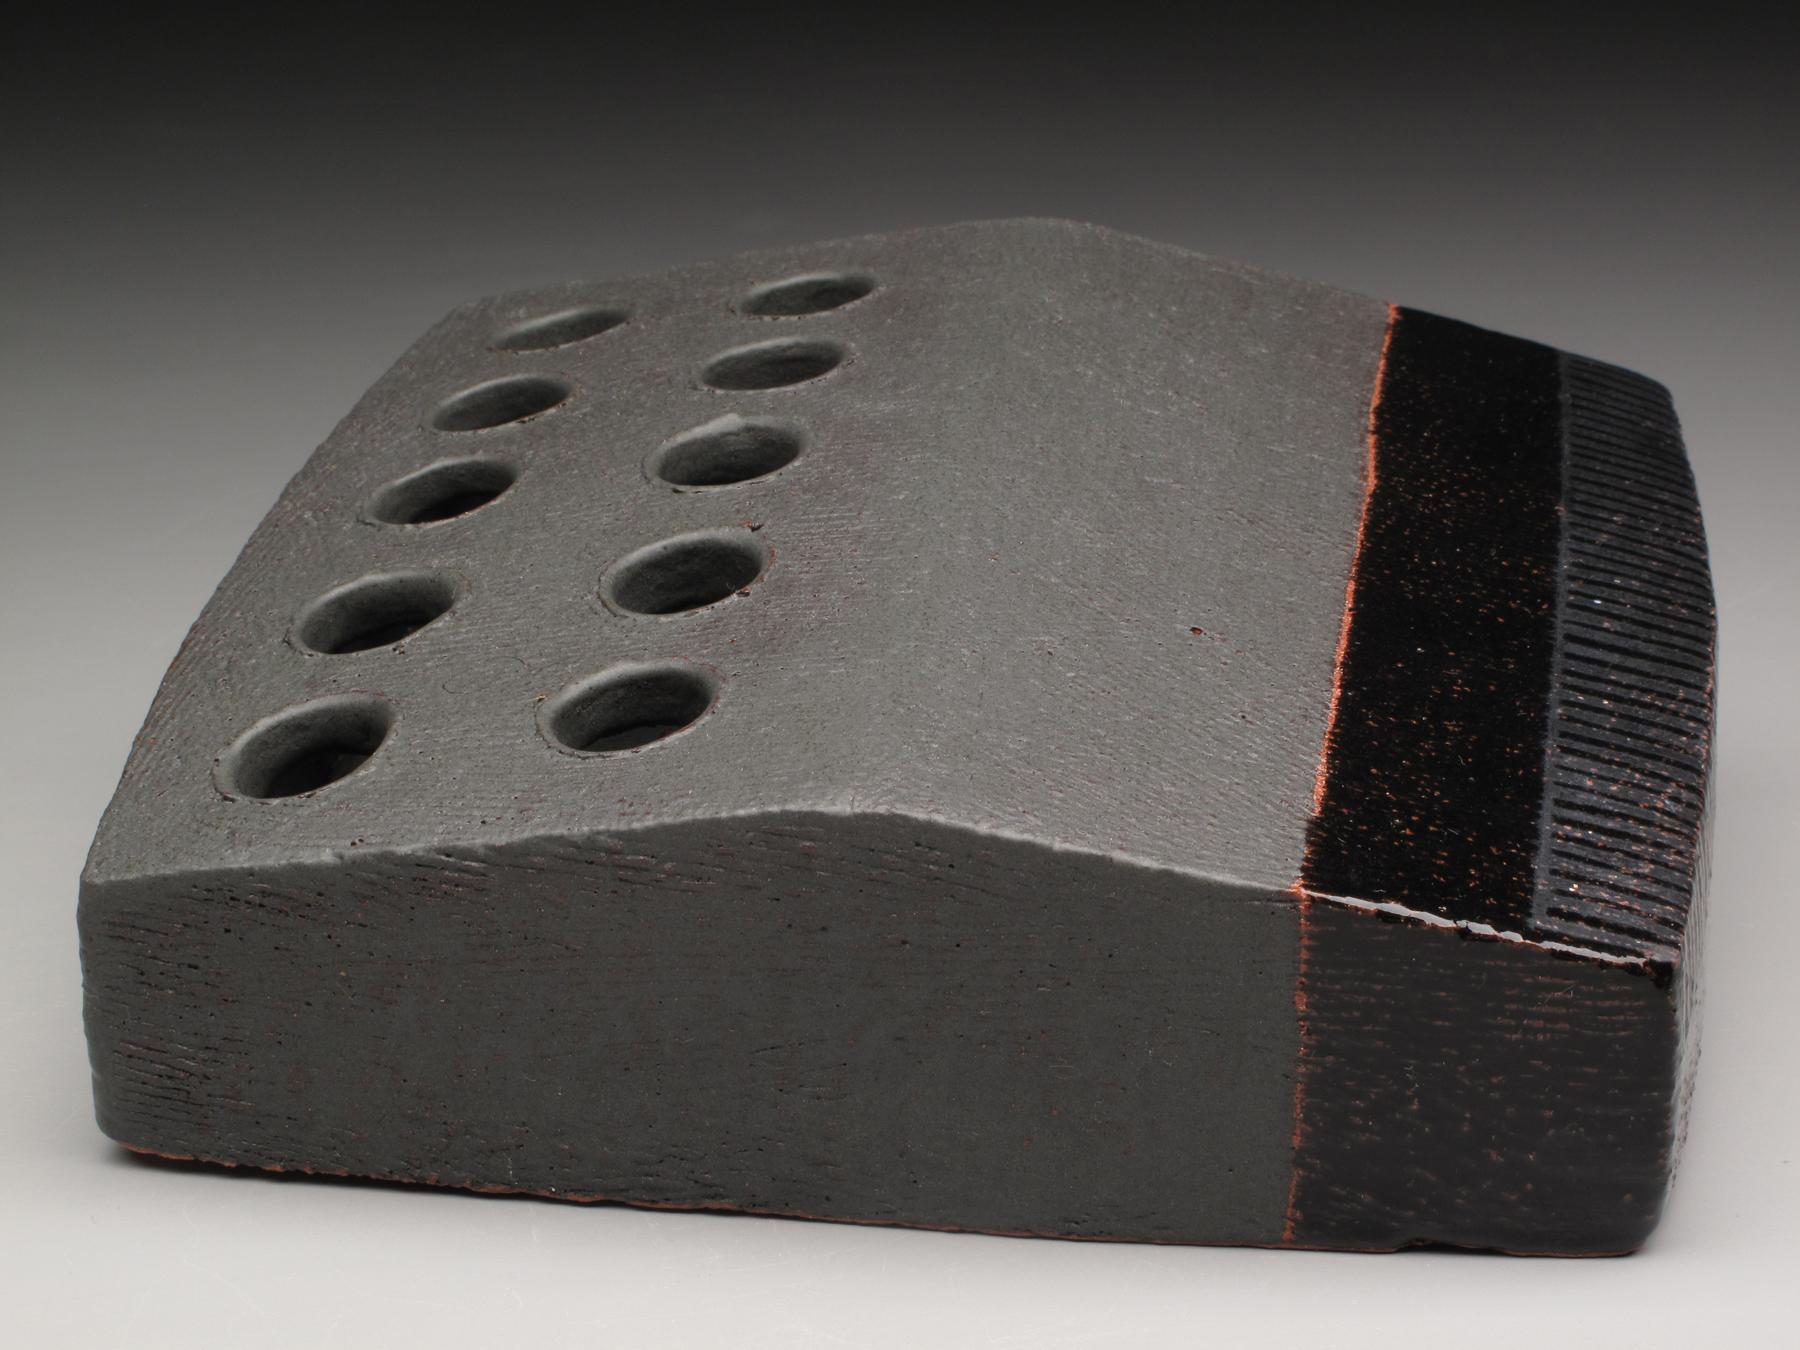 Eichelberger Small Black Box.jpg